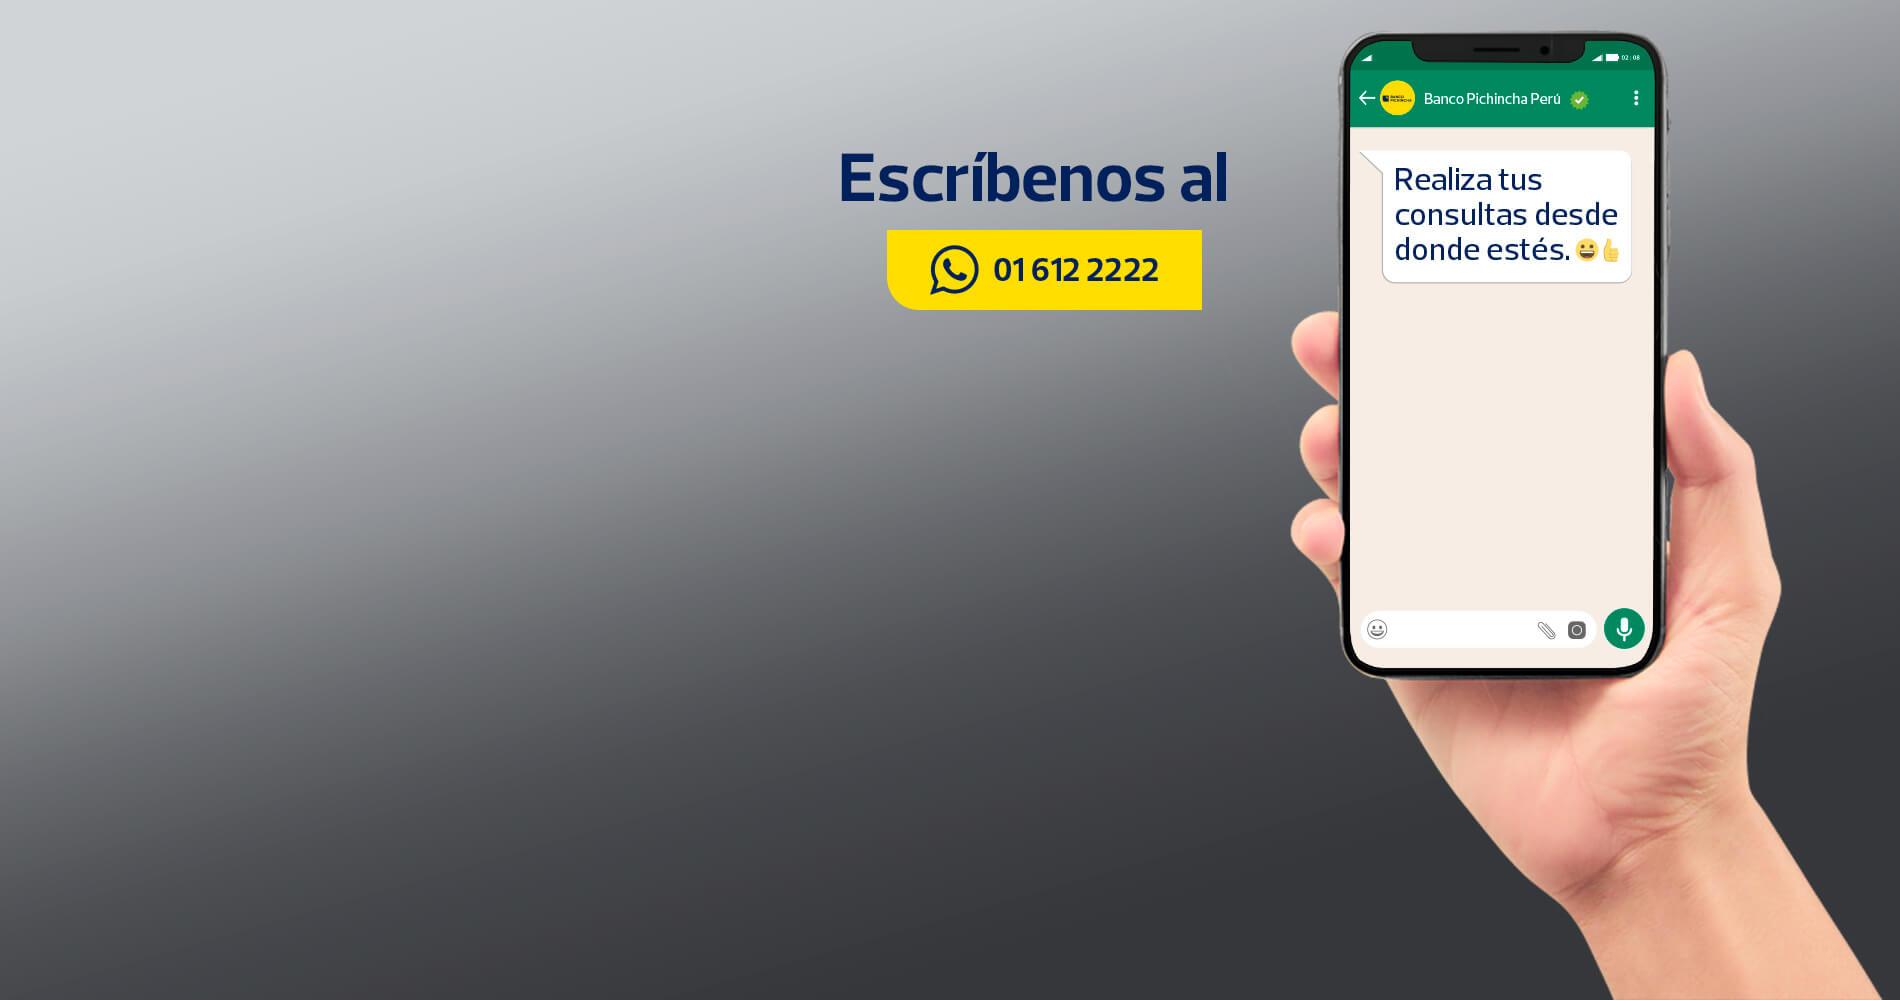 ¡Llegó el nuevo WhatsApp del Banco Pichincha!